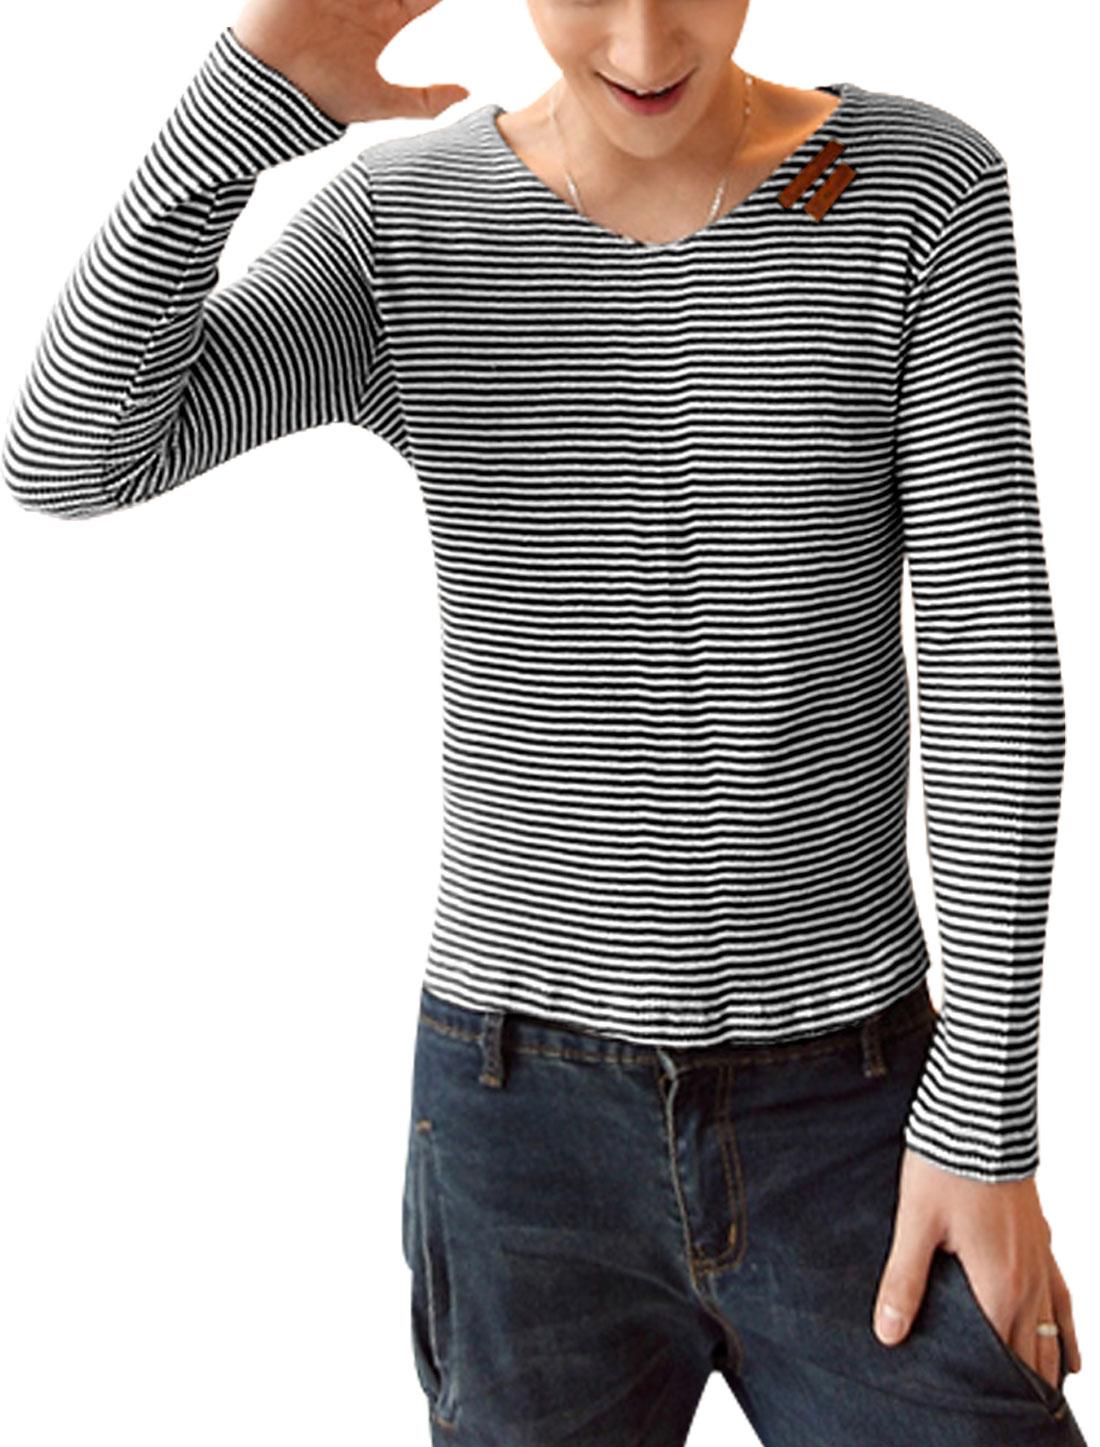 Men Imitation Leather Decor Stripes Stretchy Top Shirt Black White S